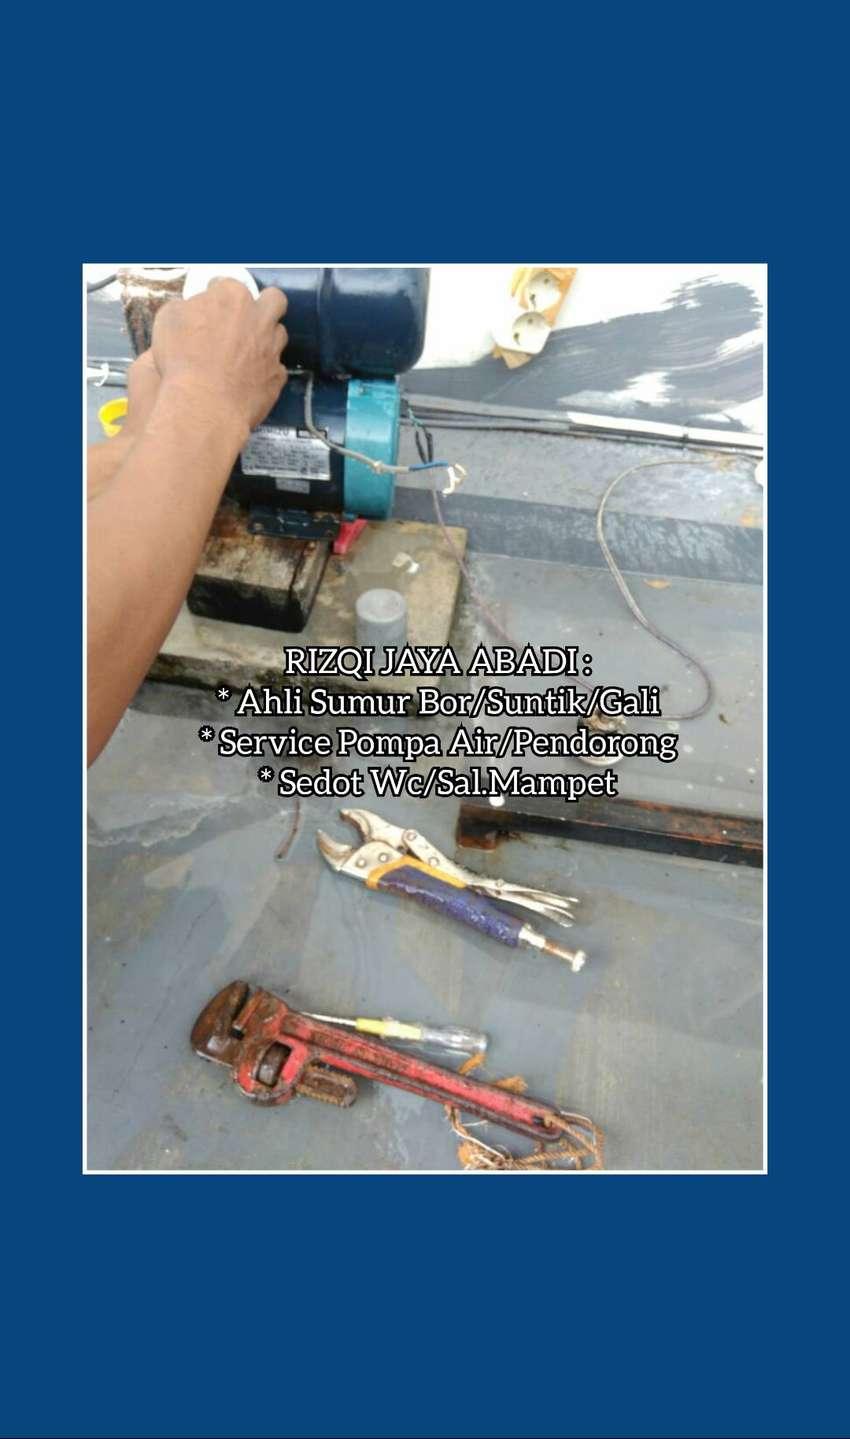 Service Pompa Air Servis Sanyo Pendorong Otomatis Suntik Sumur Jogja 0